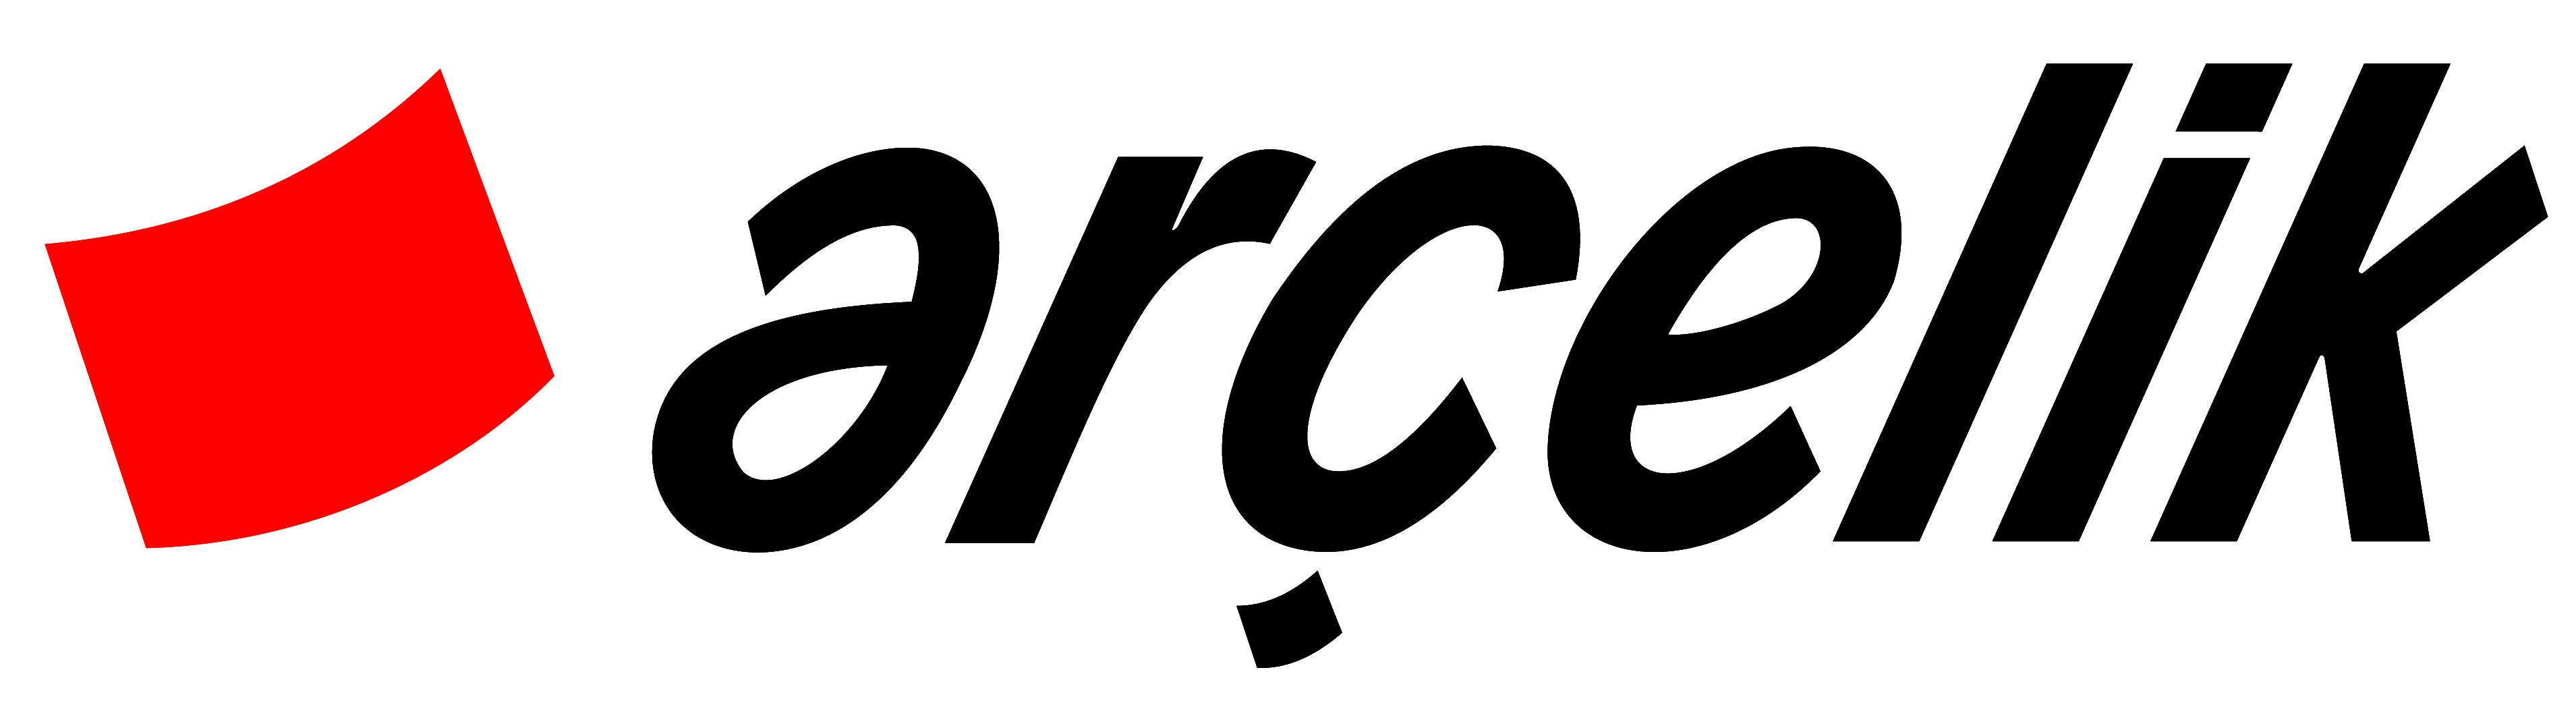 http://bodrumservisiniz.com/wp-content/uploads/2017/03/logo-1.png